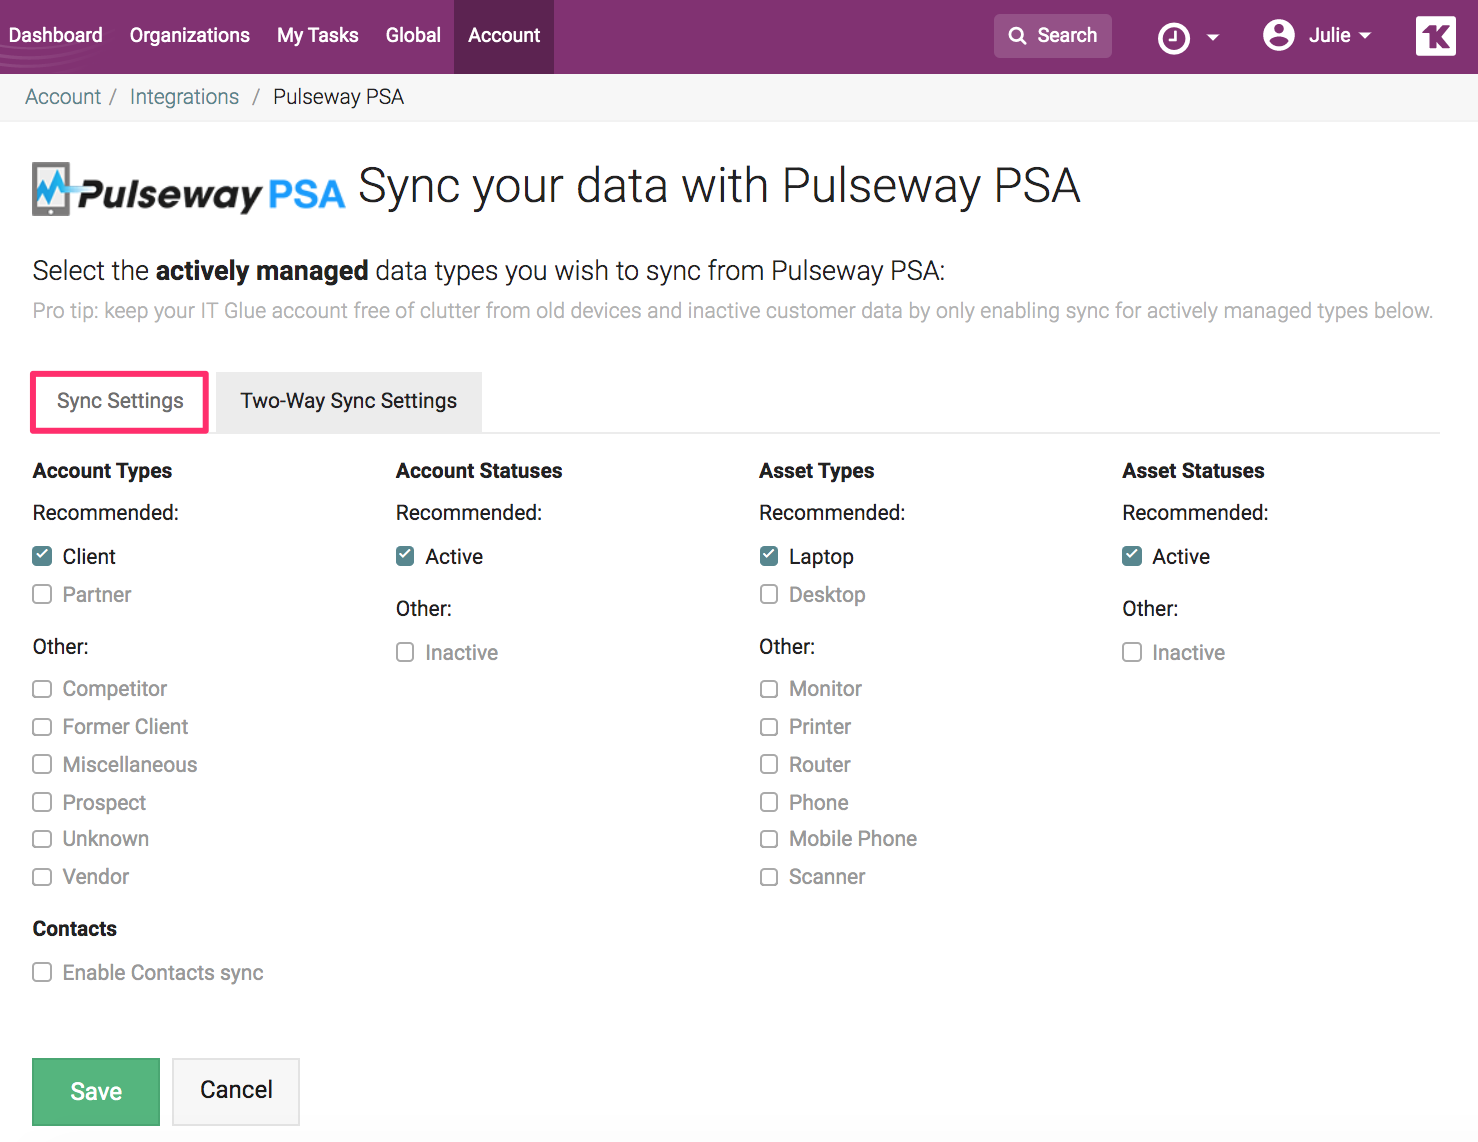 Pulseway_PSA___IT_Glue.png